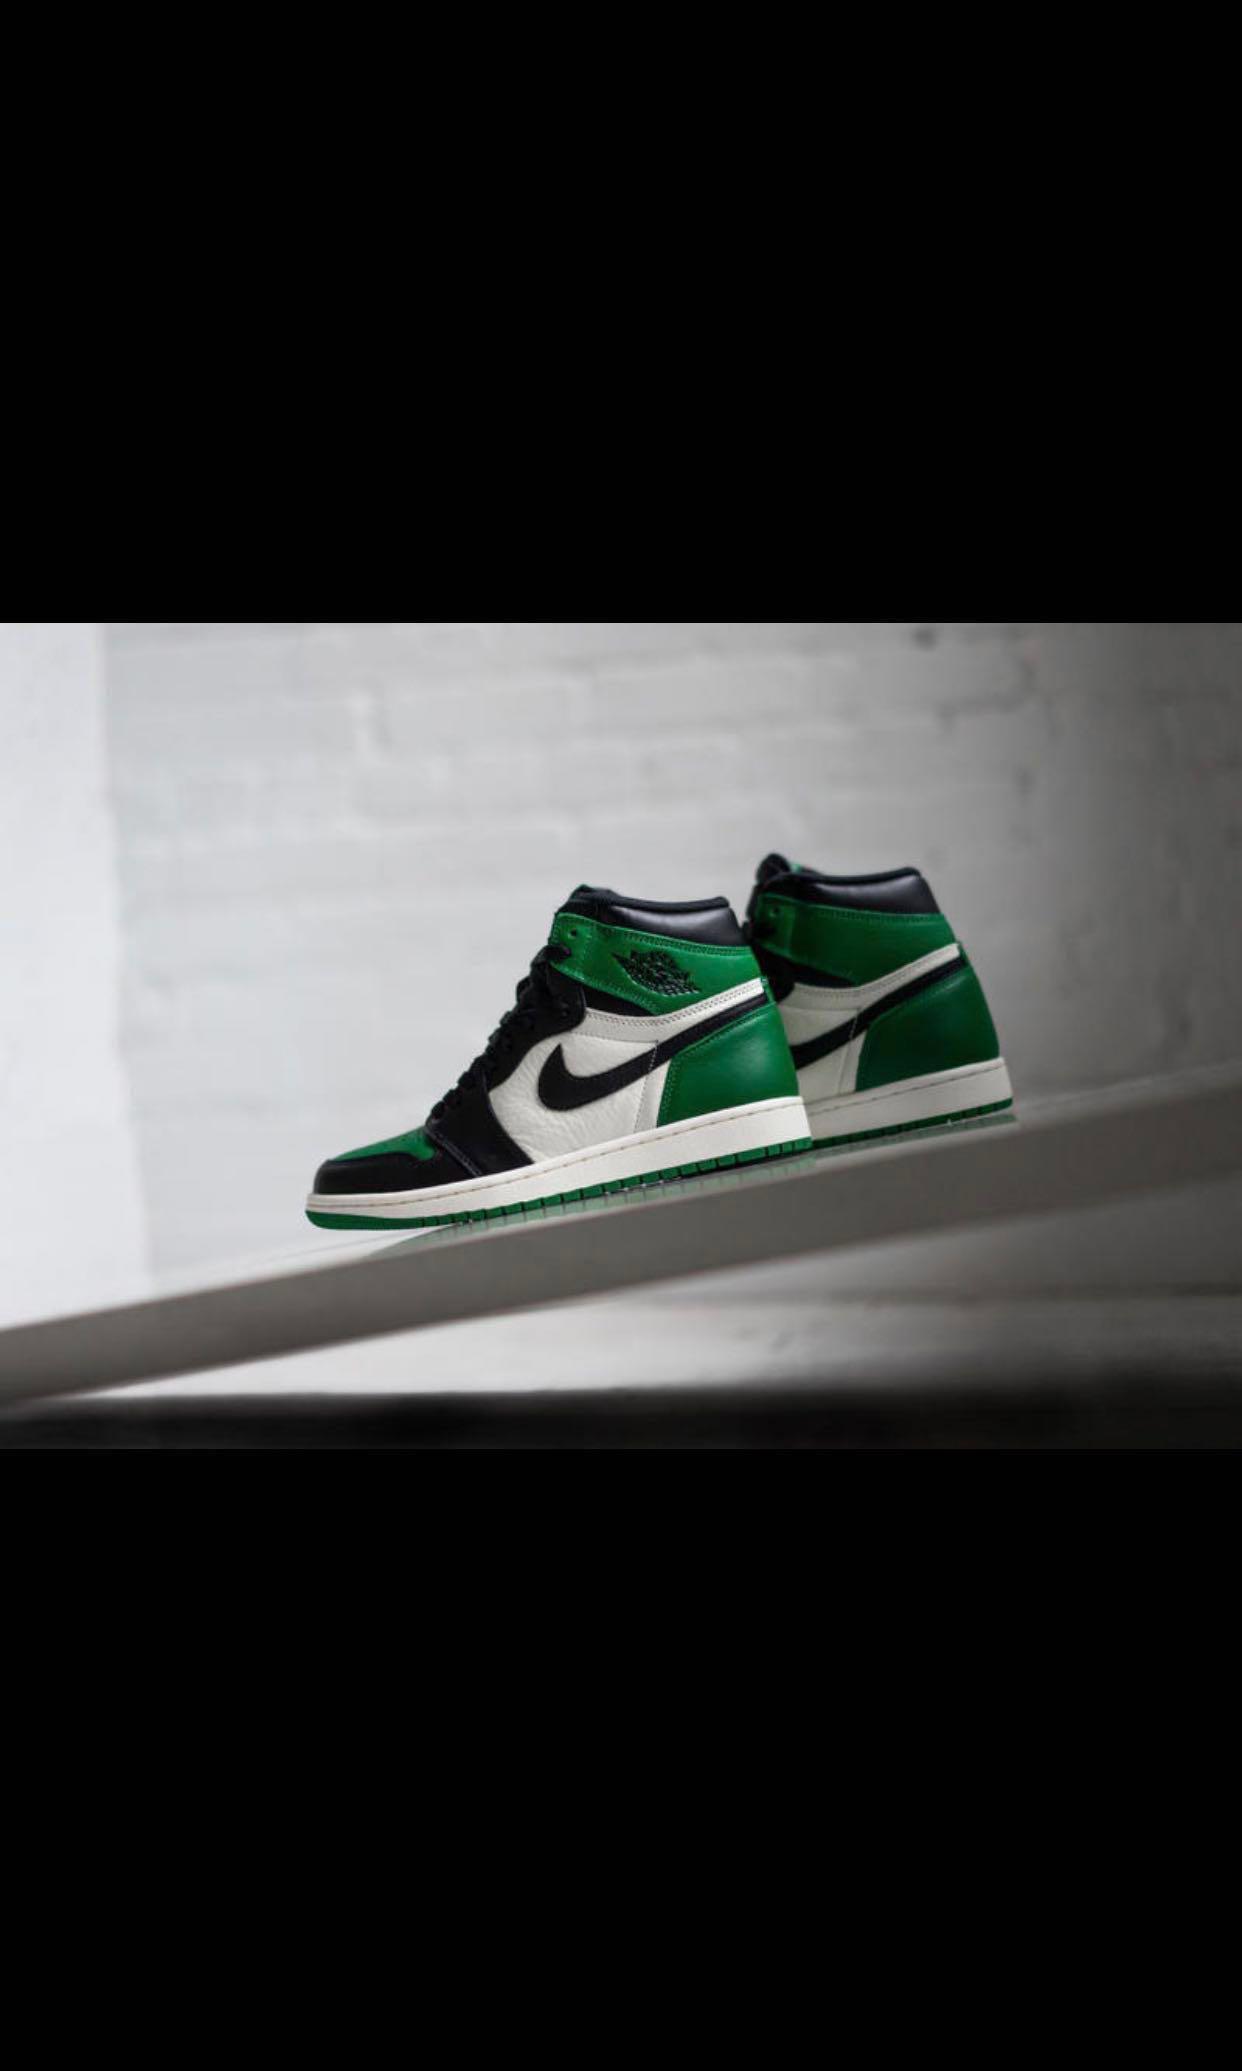 8be2ffe82a94 Air Jordan 1 OG Pine Green